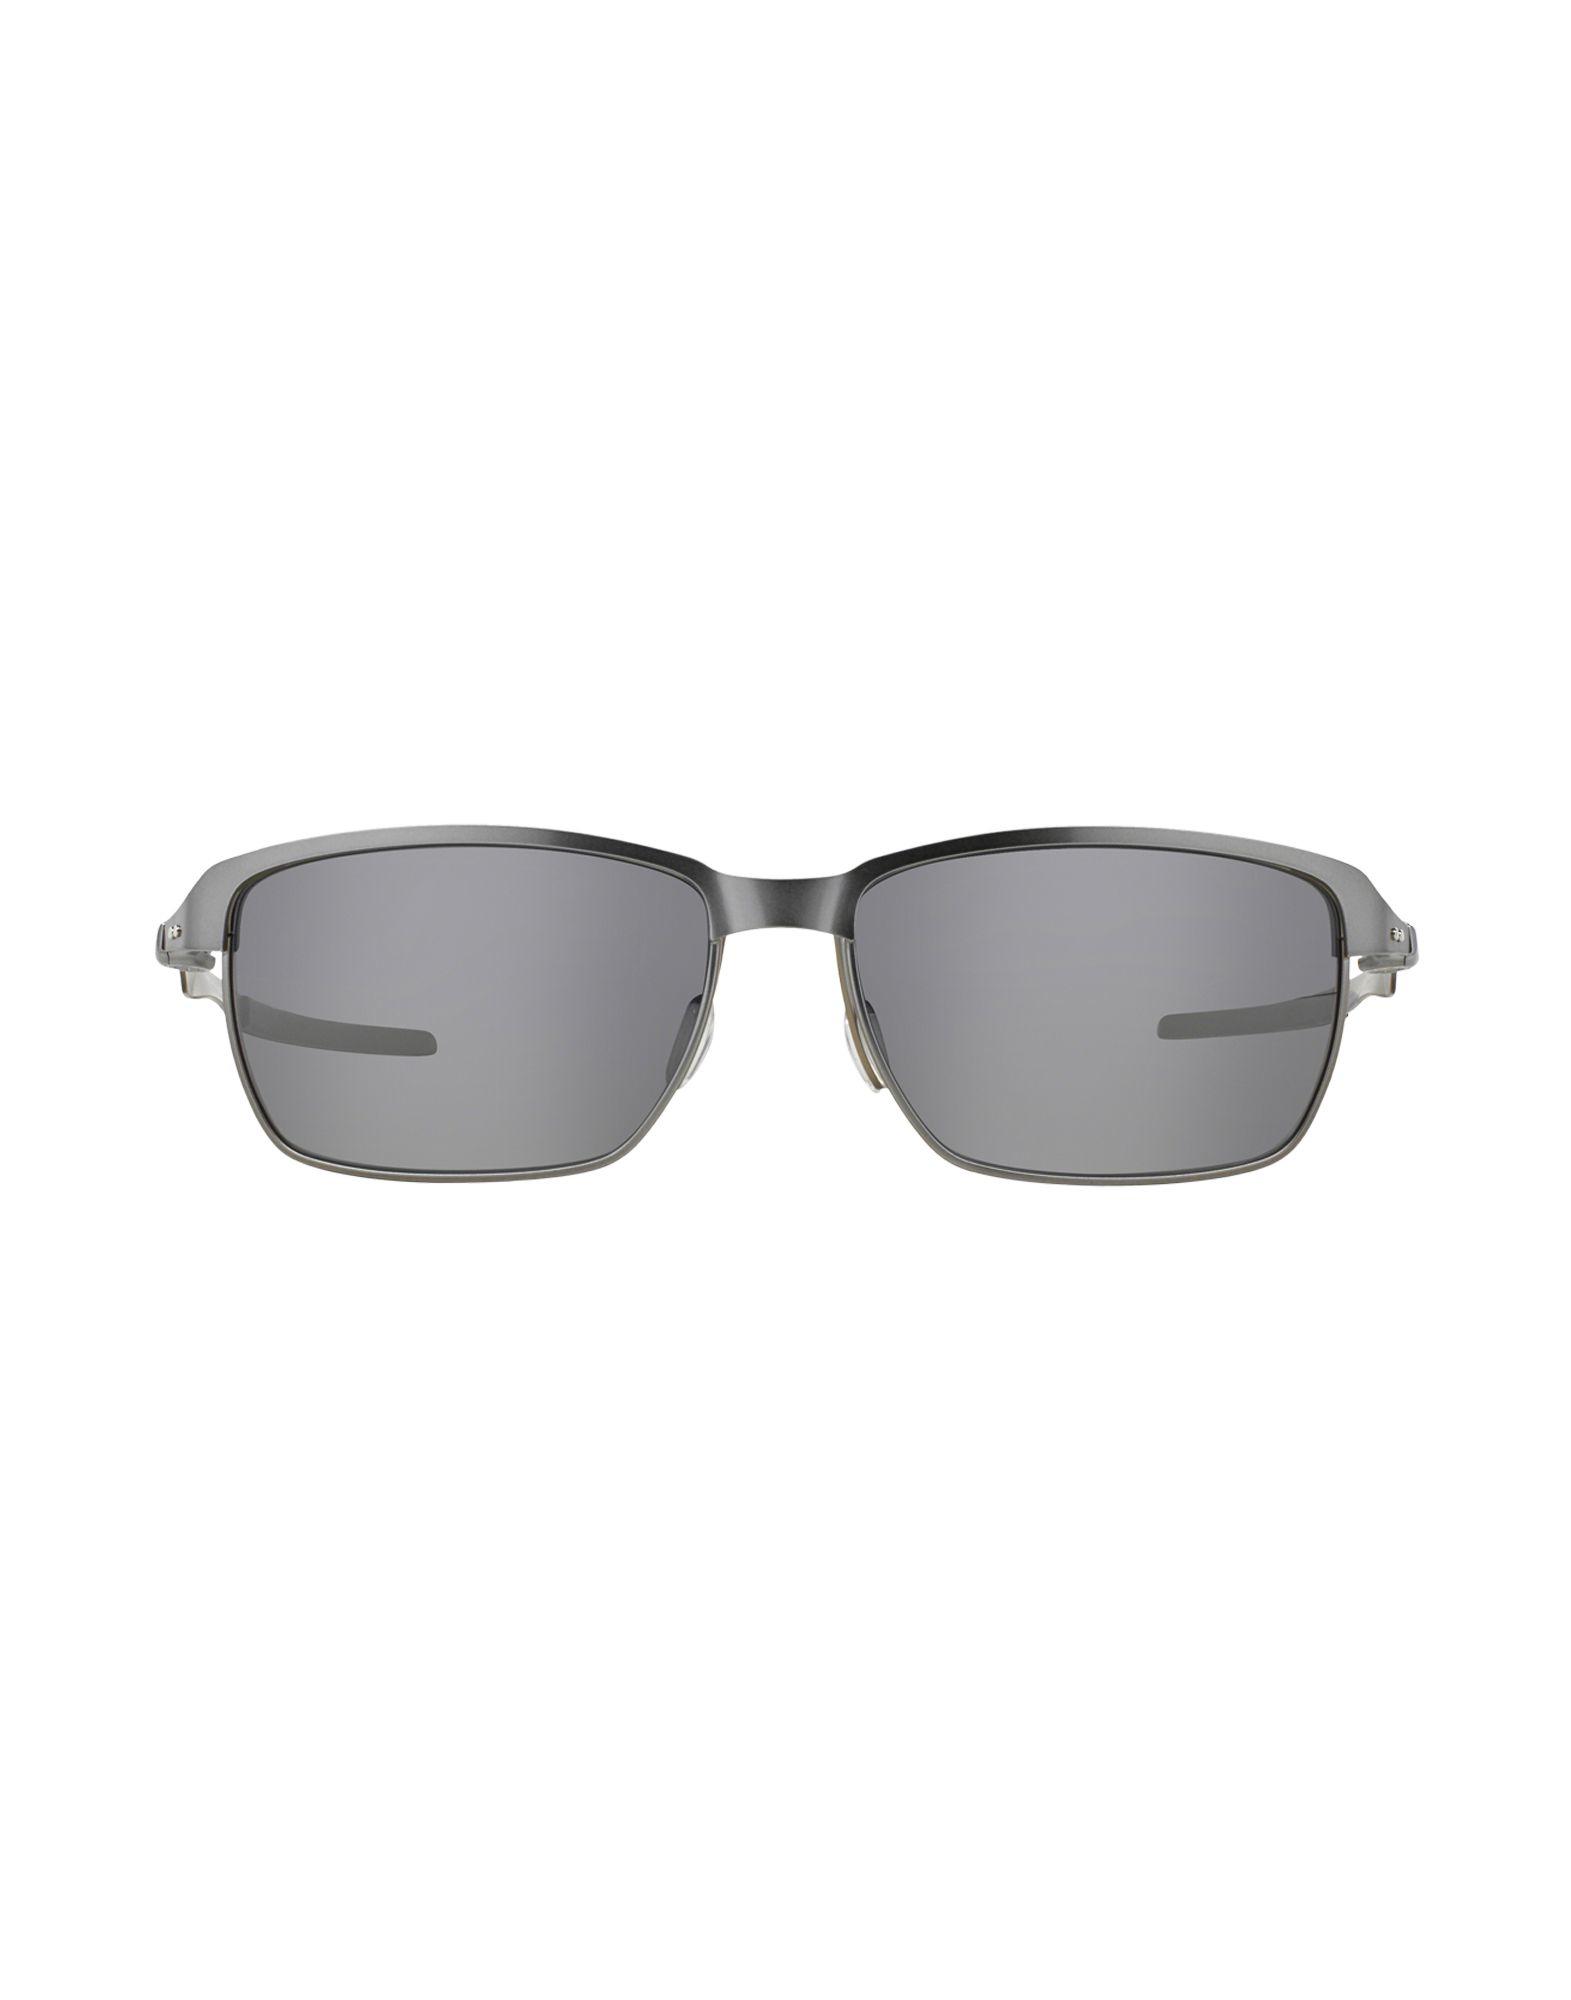 oakley sunglasses for men 2015 louisiana bucket brigade